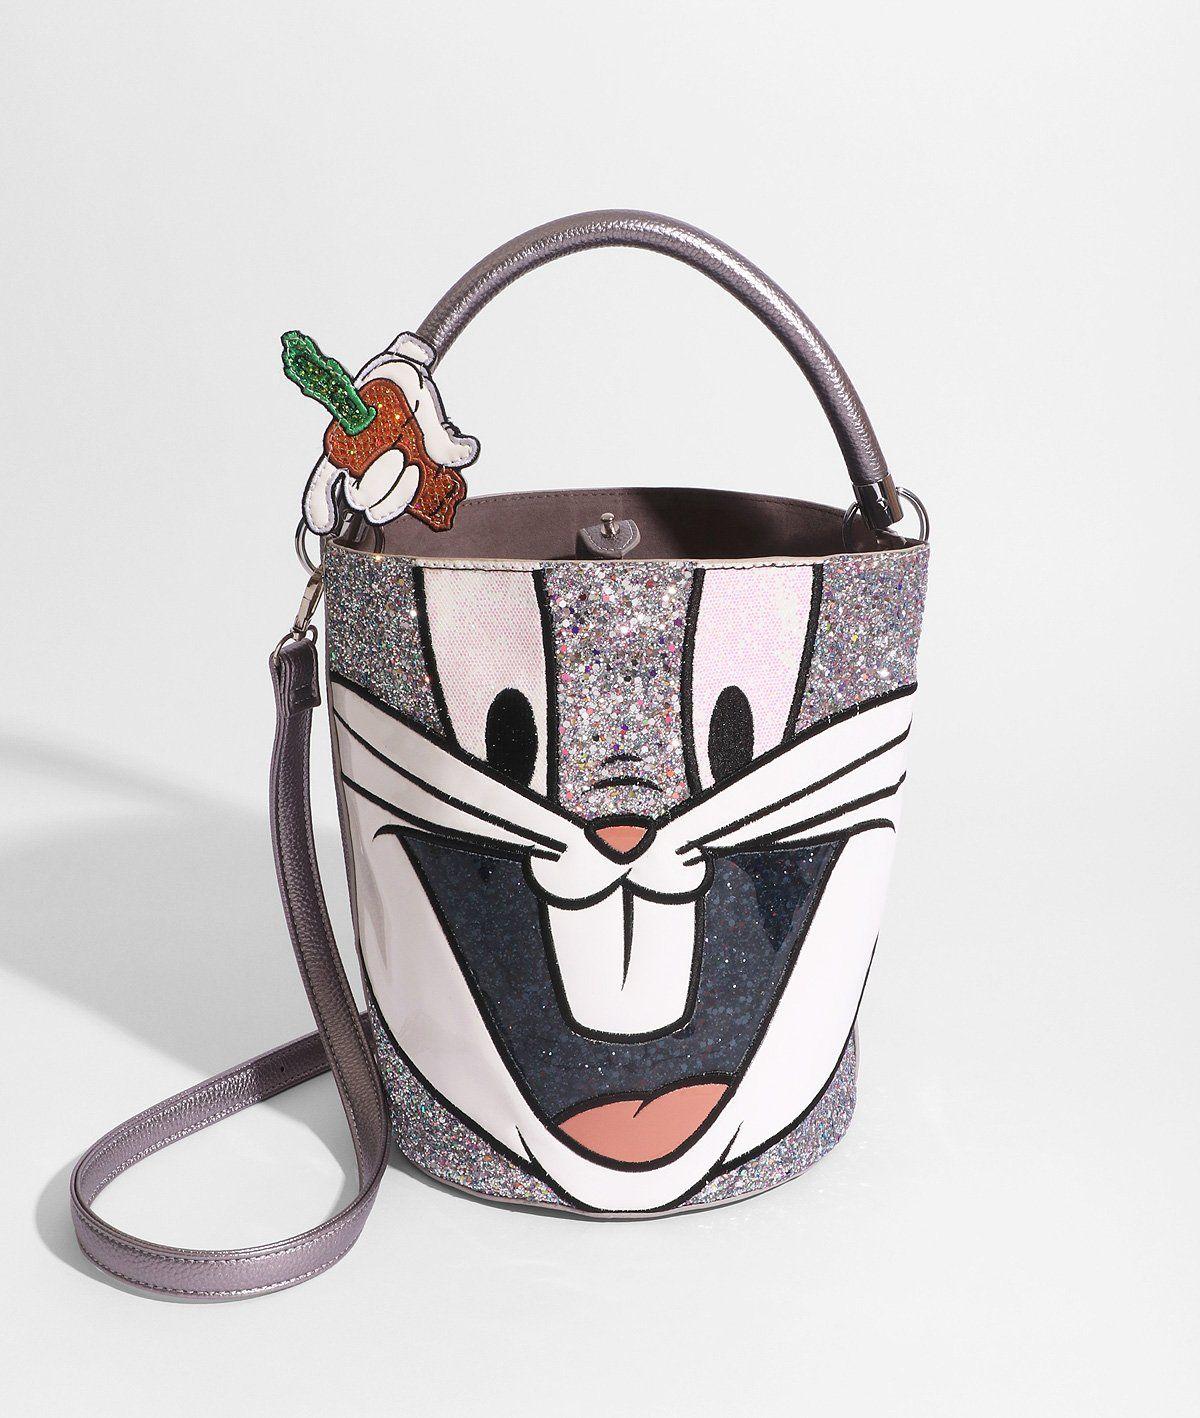 e117726e67 Looney Tunes x Danielle Nicole Bugs Bunny Bucket Bag